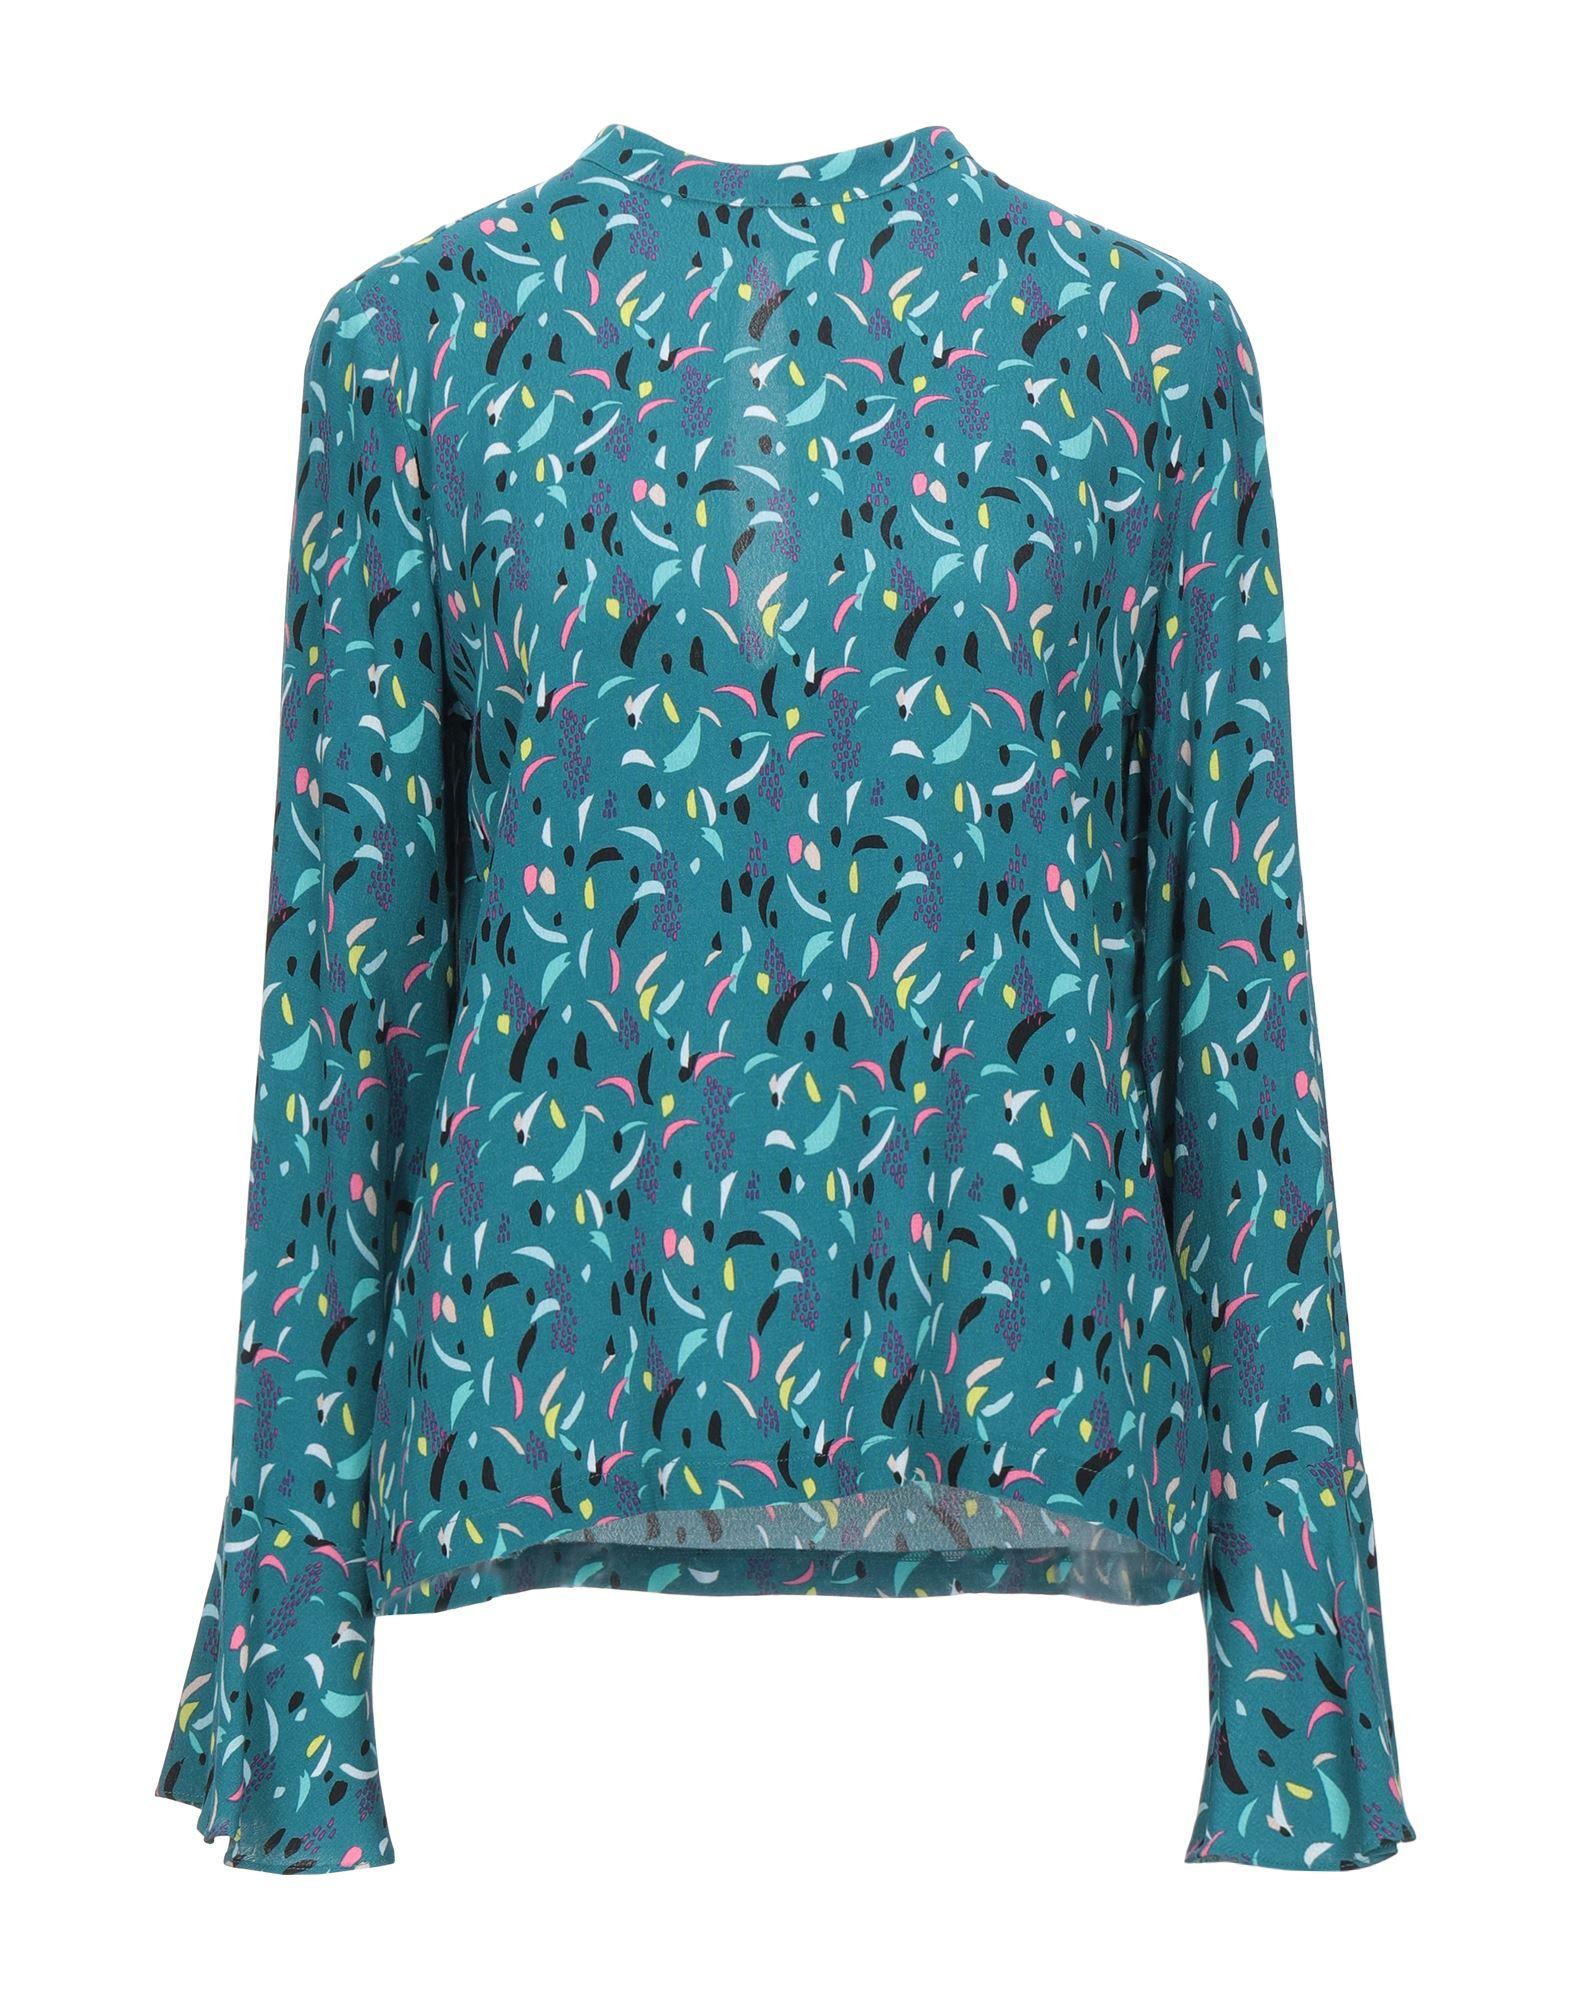 блузка женская pepe jeans цвет голубой 097 pl303212 0aa размер xs 40 PEPE JEANS Блузка